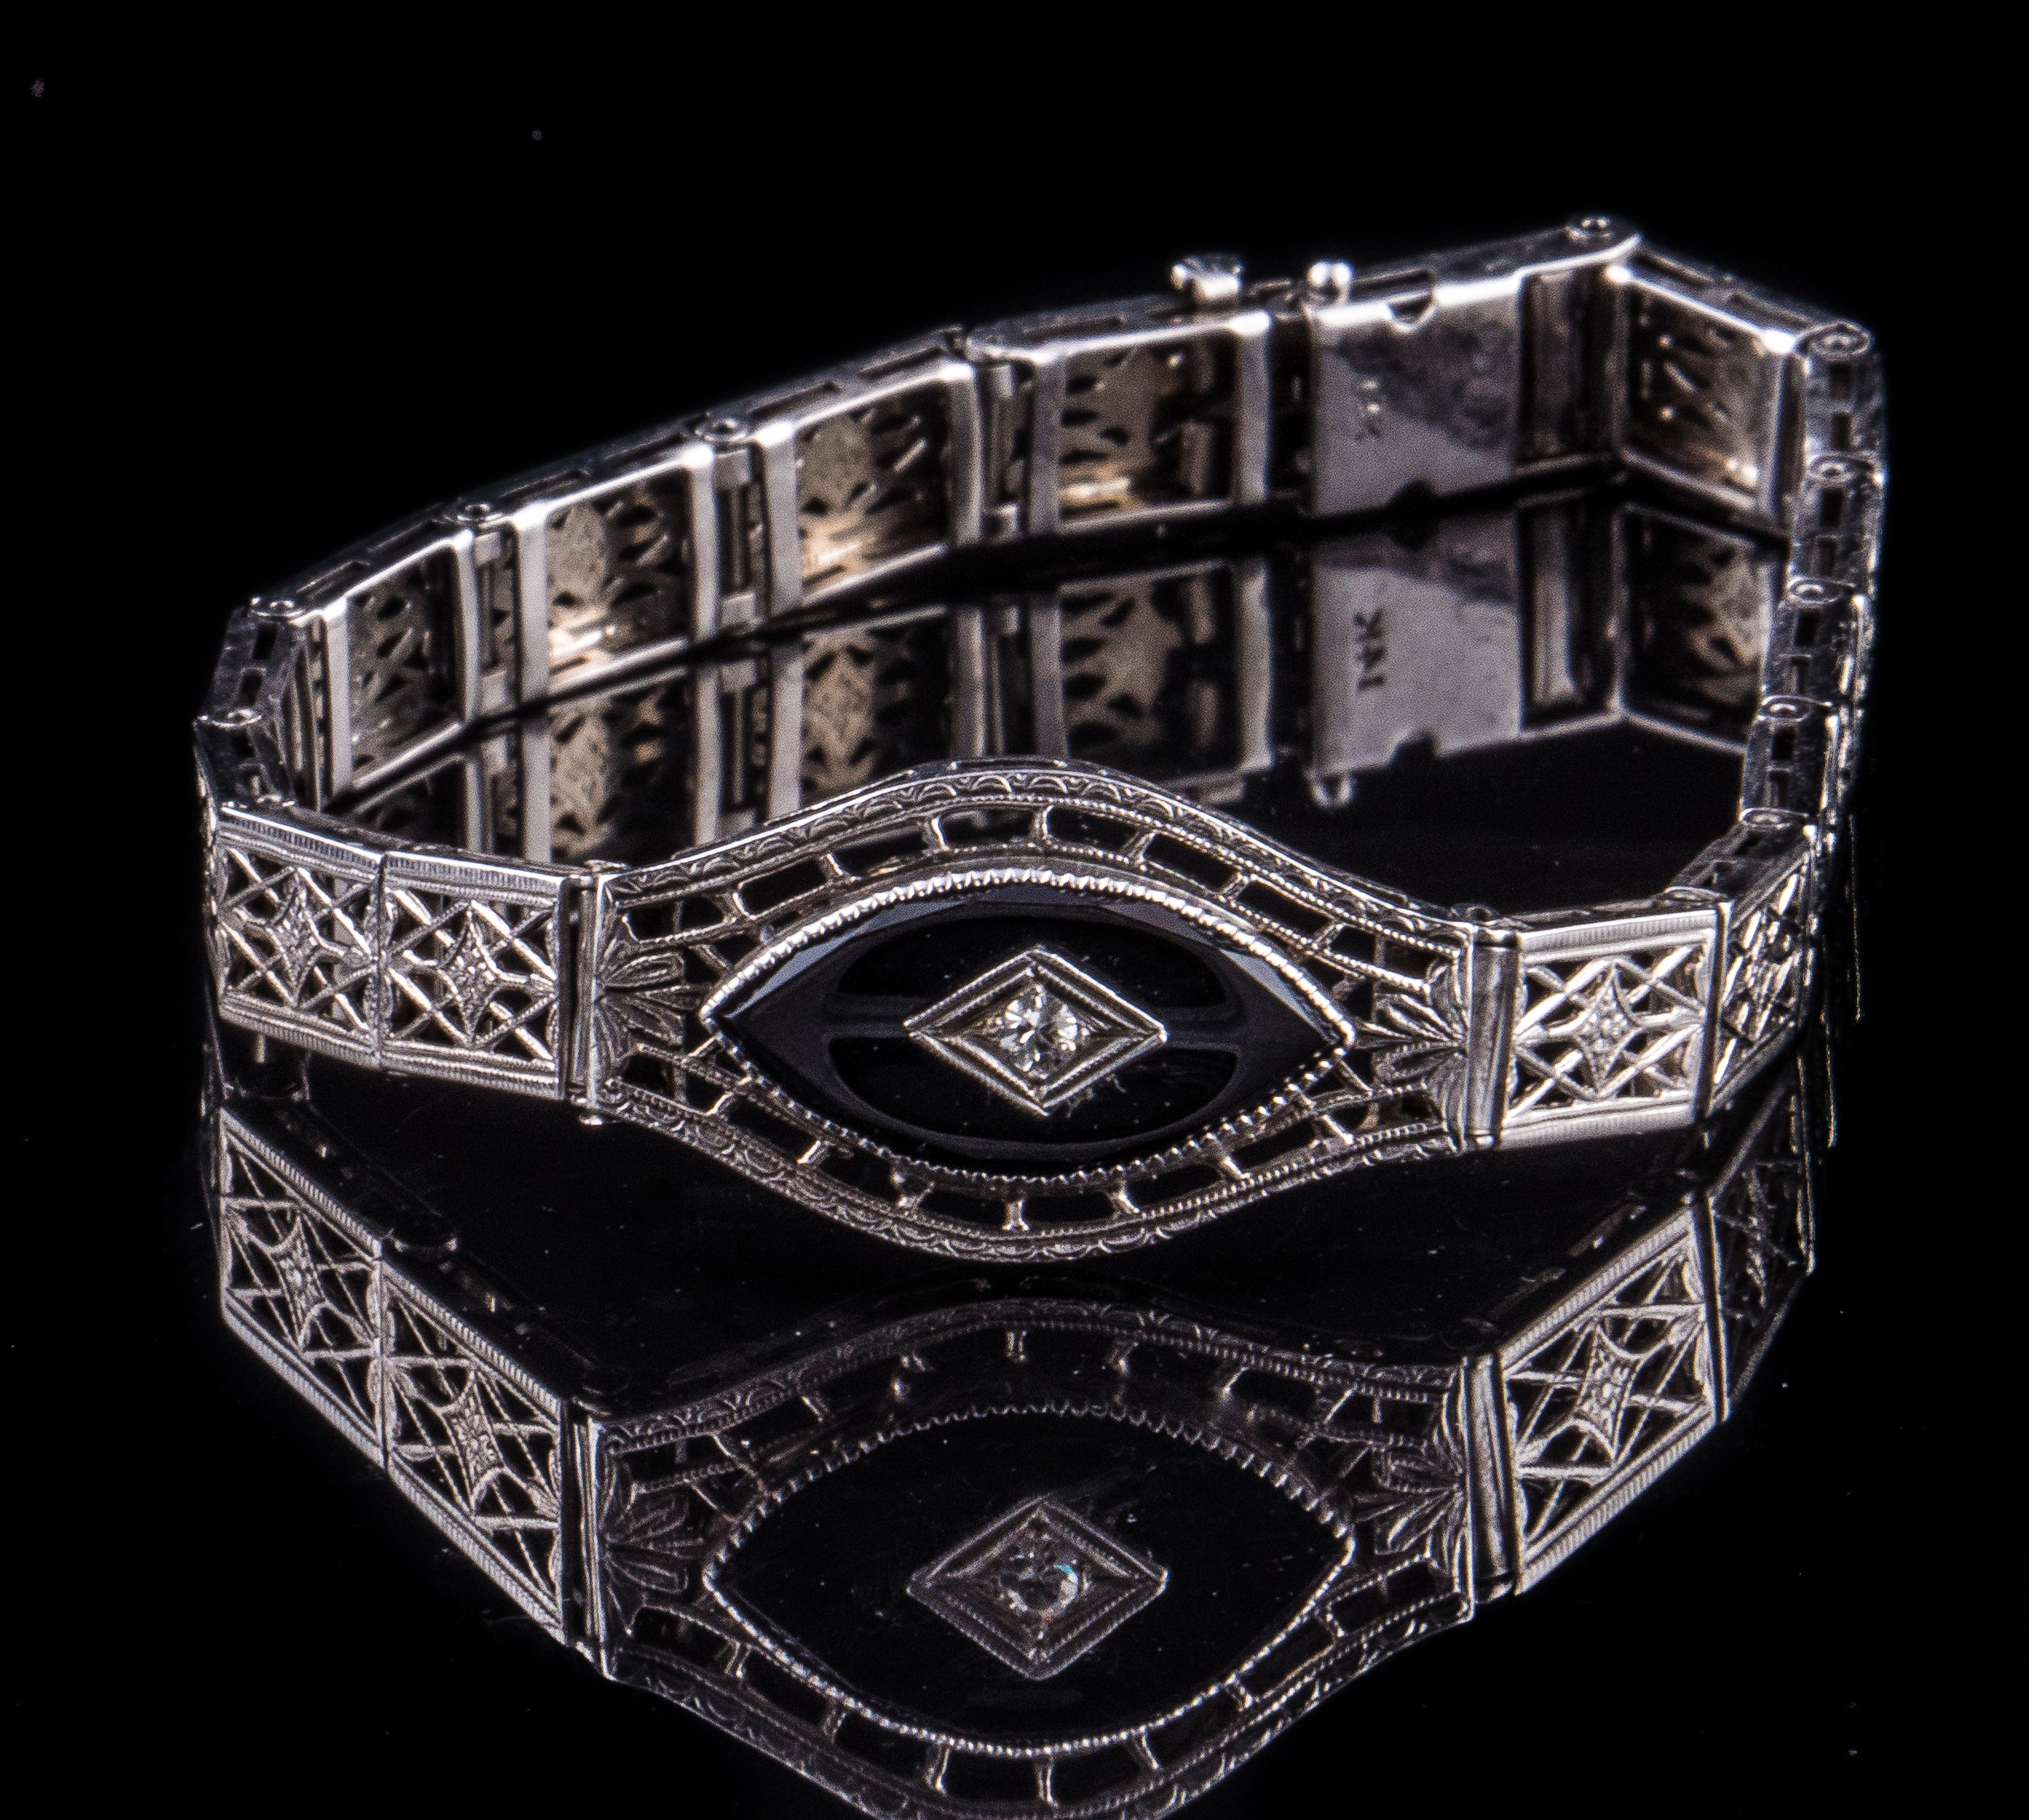 Art Deco 14kt filigree onyx bracelet with diamond accent